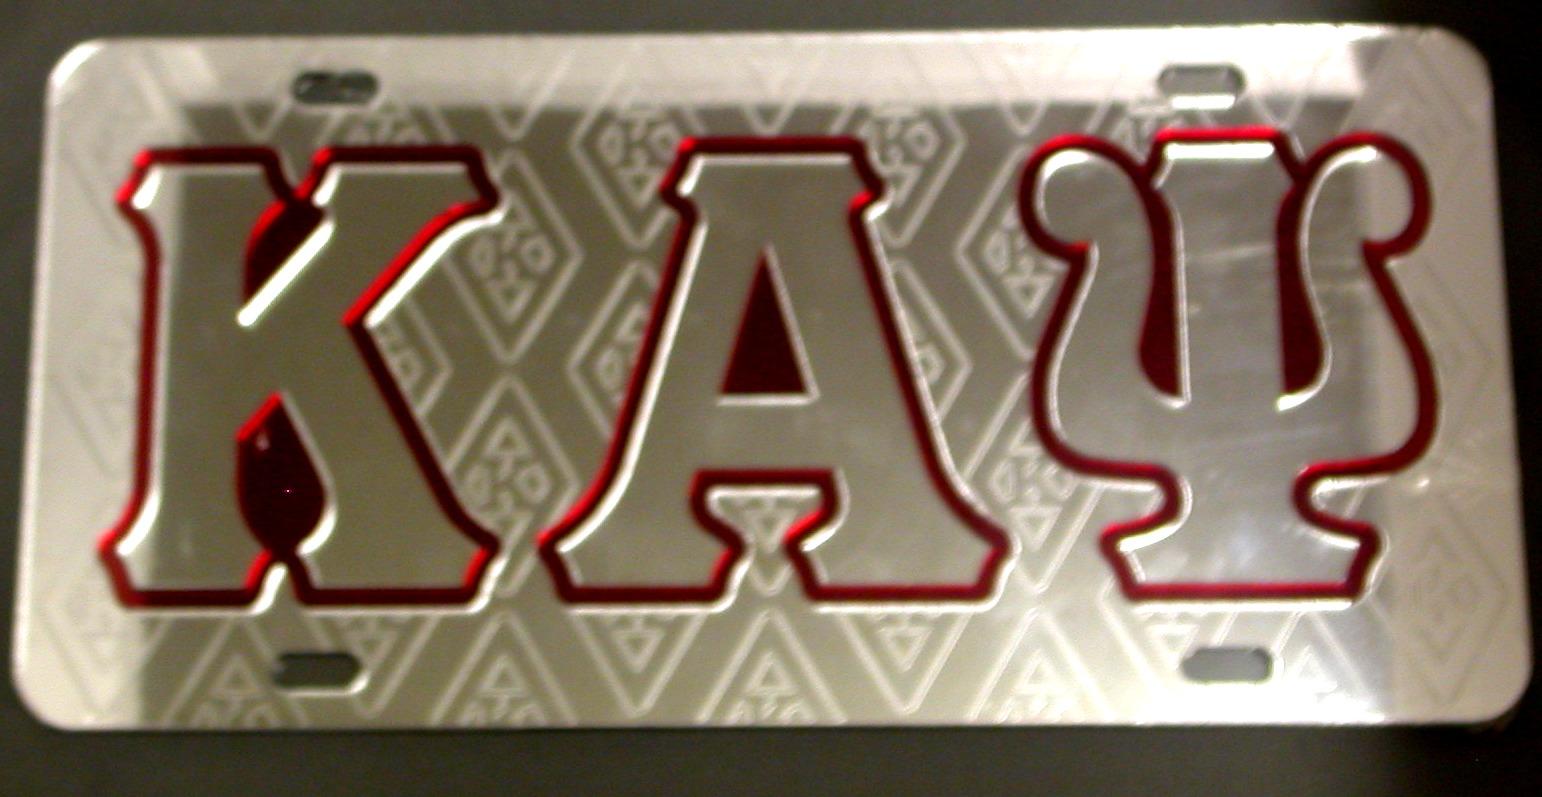 AKA Kappa Omega Car License Plates Frames Badges  Greekstuffcom 1542x797